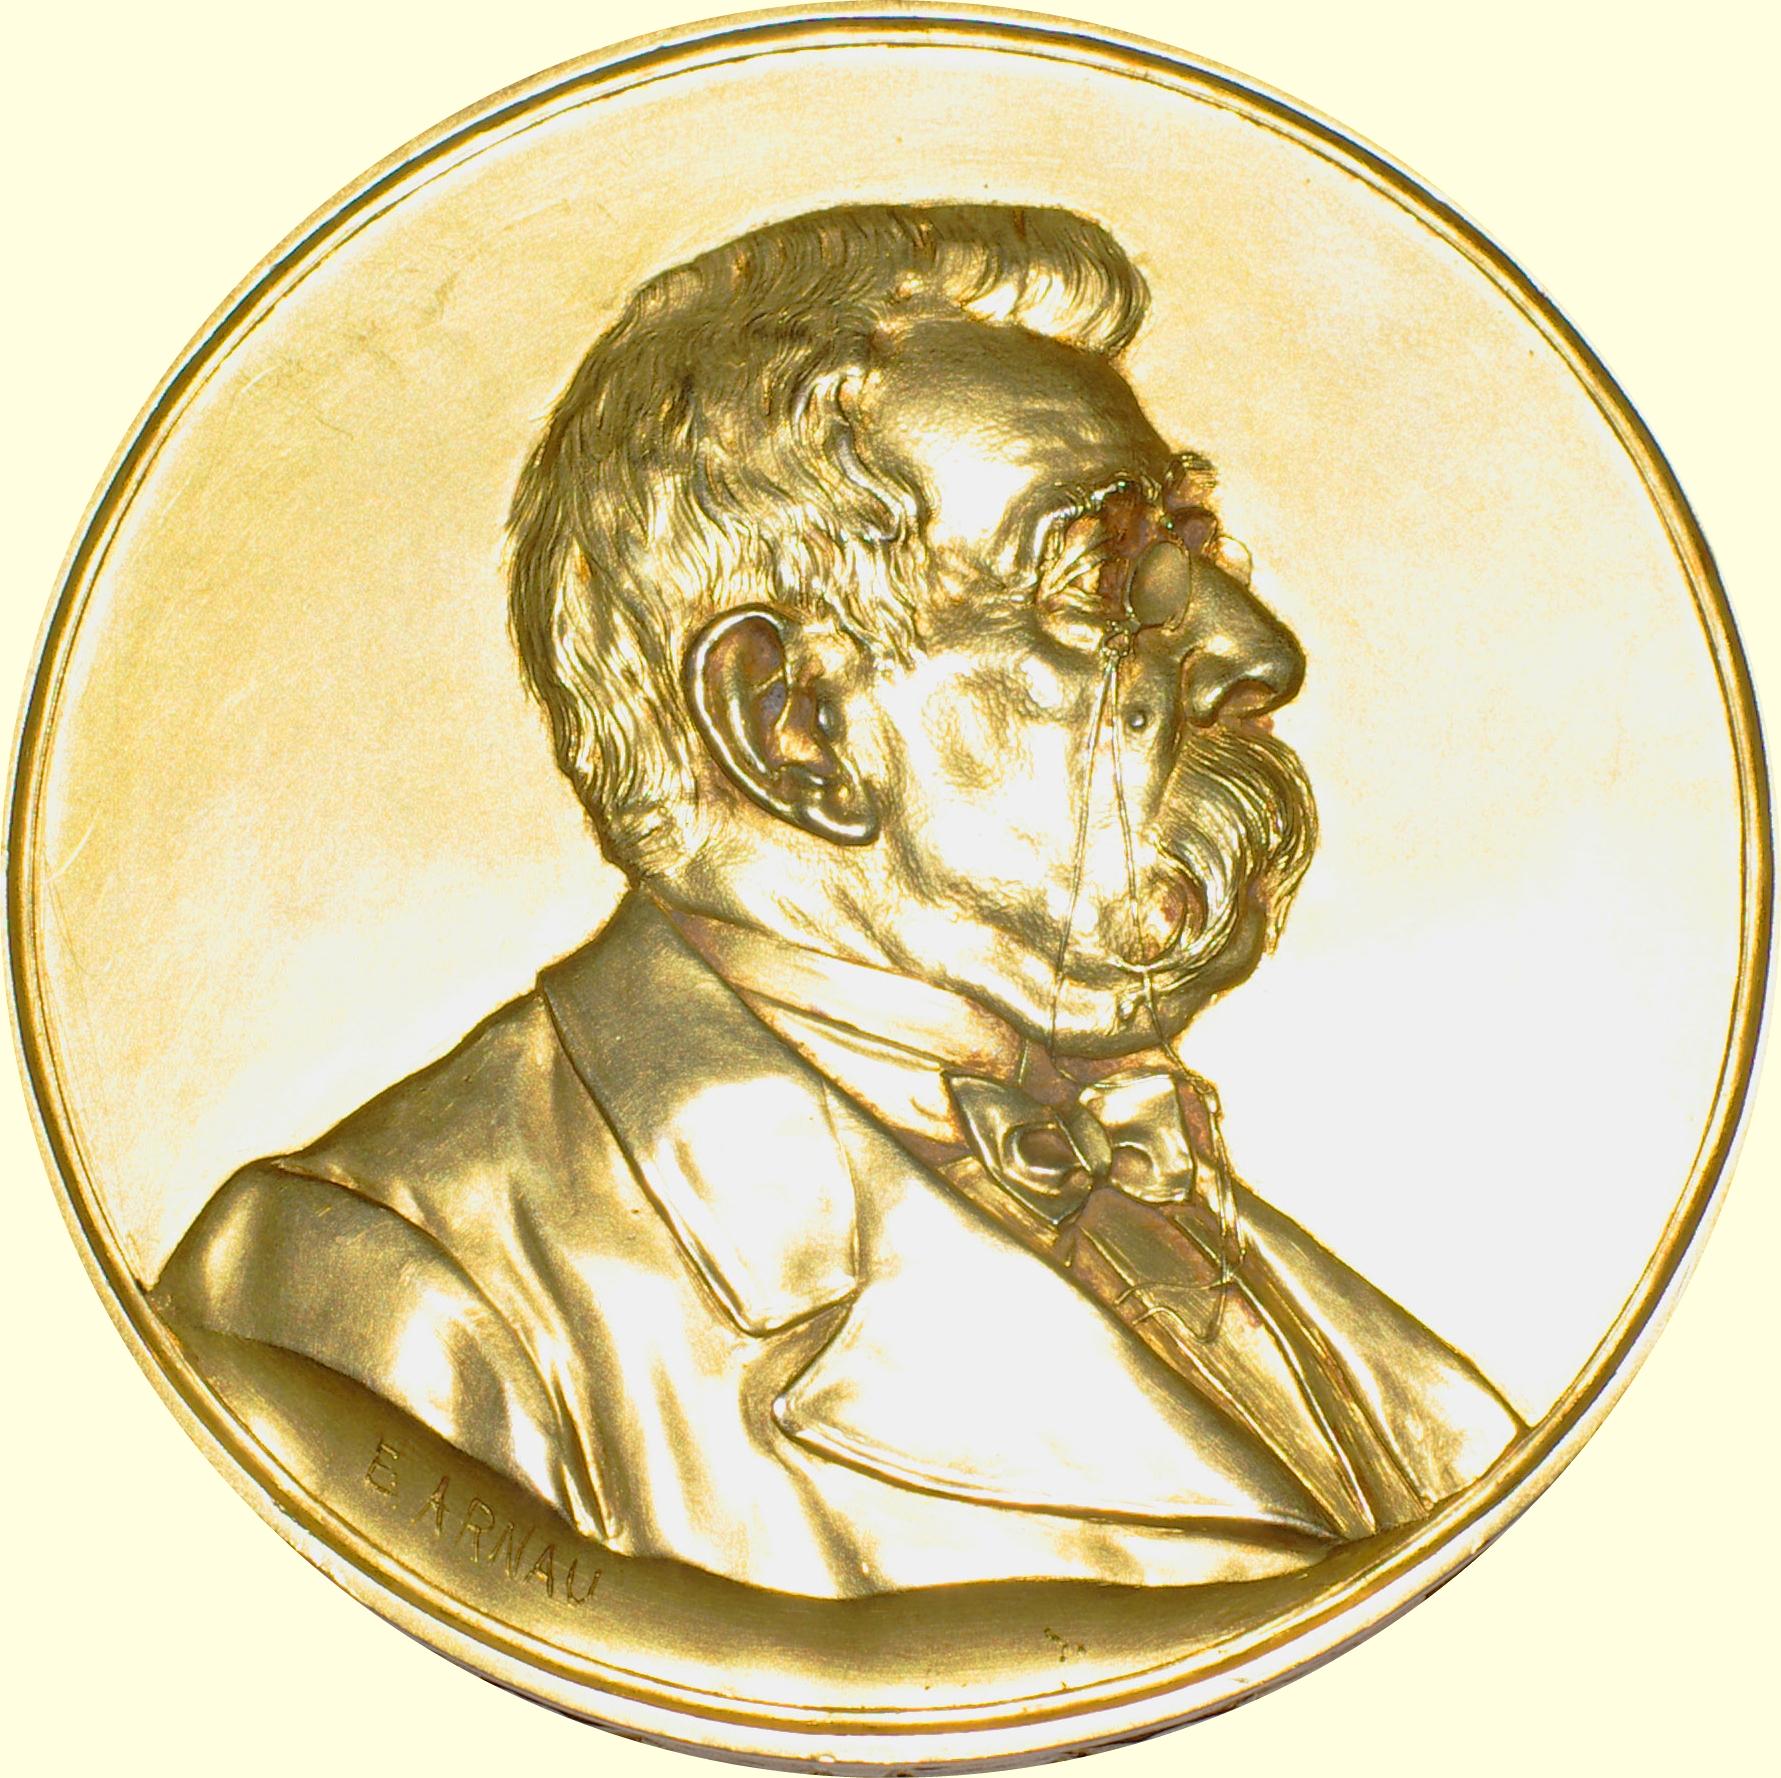 Medalla Manuel Duran i Bas